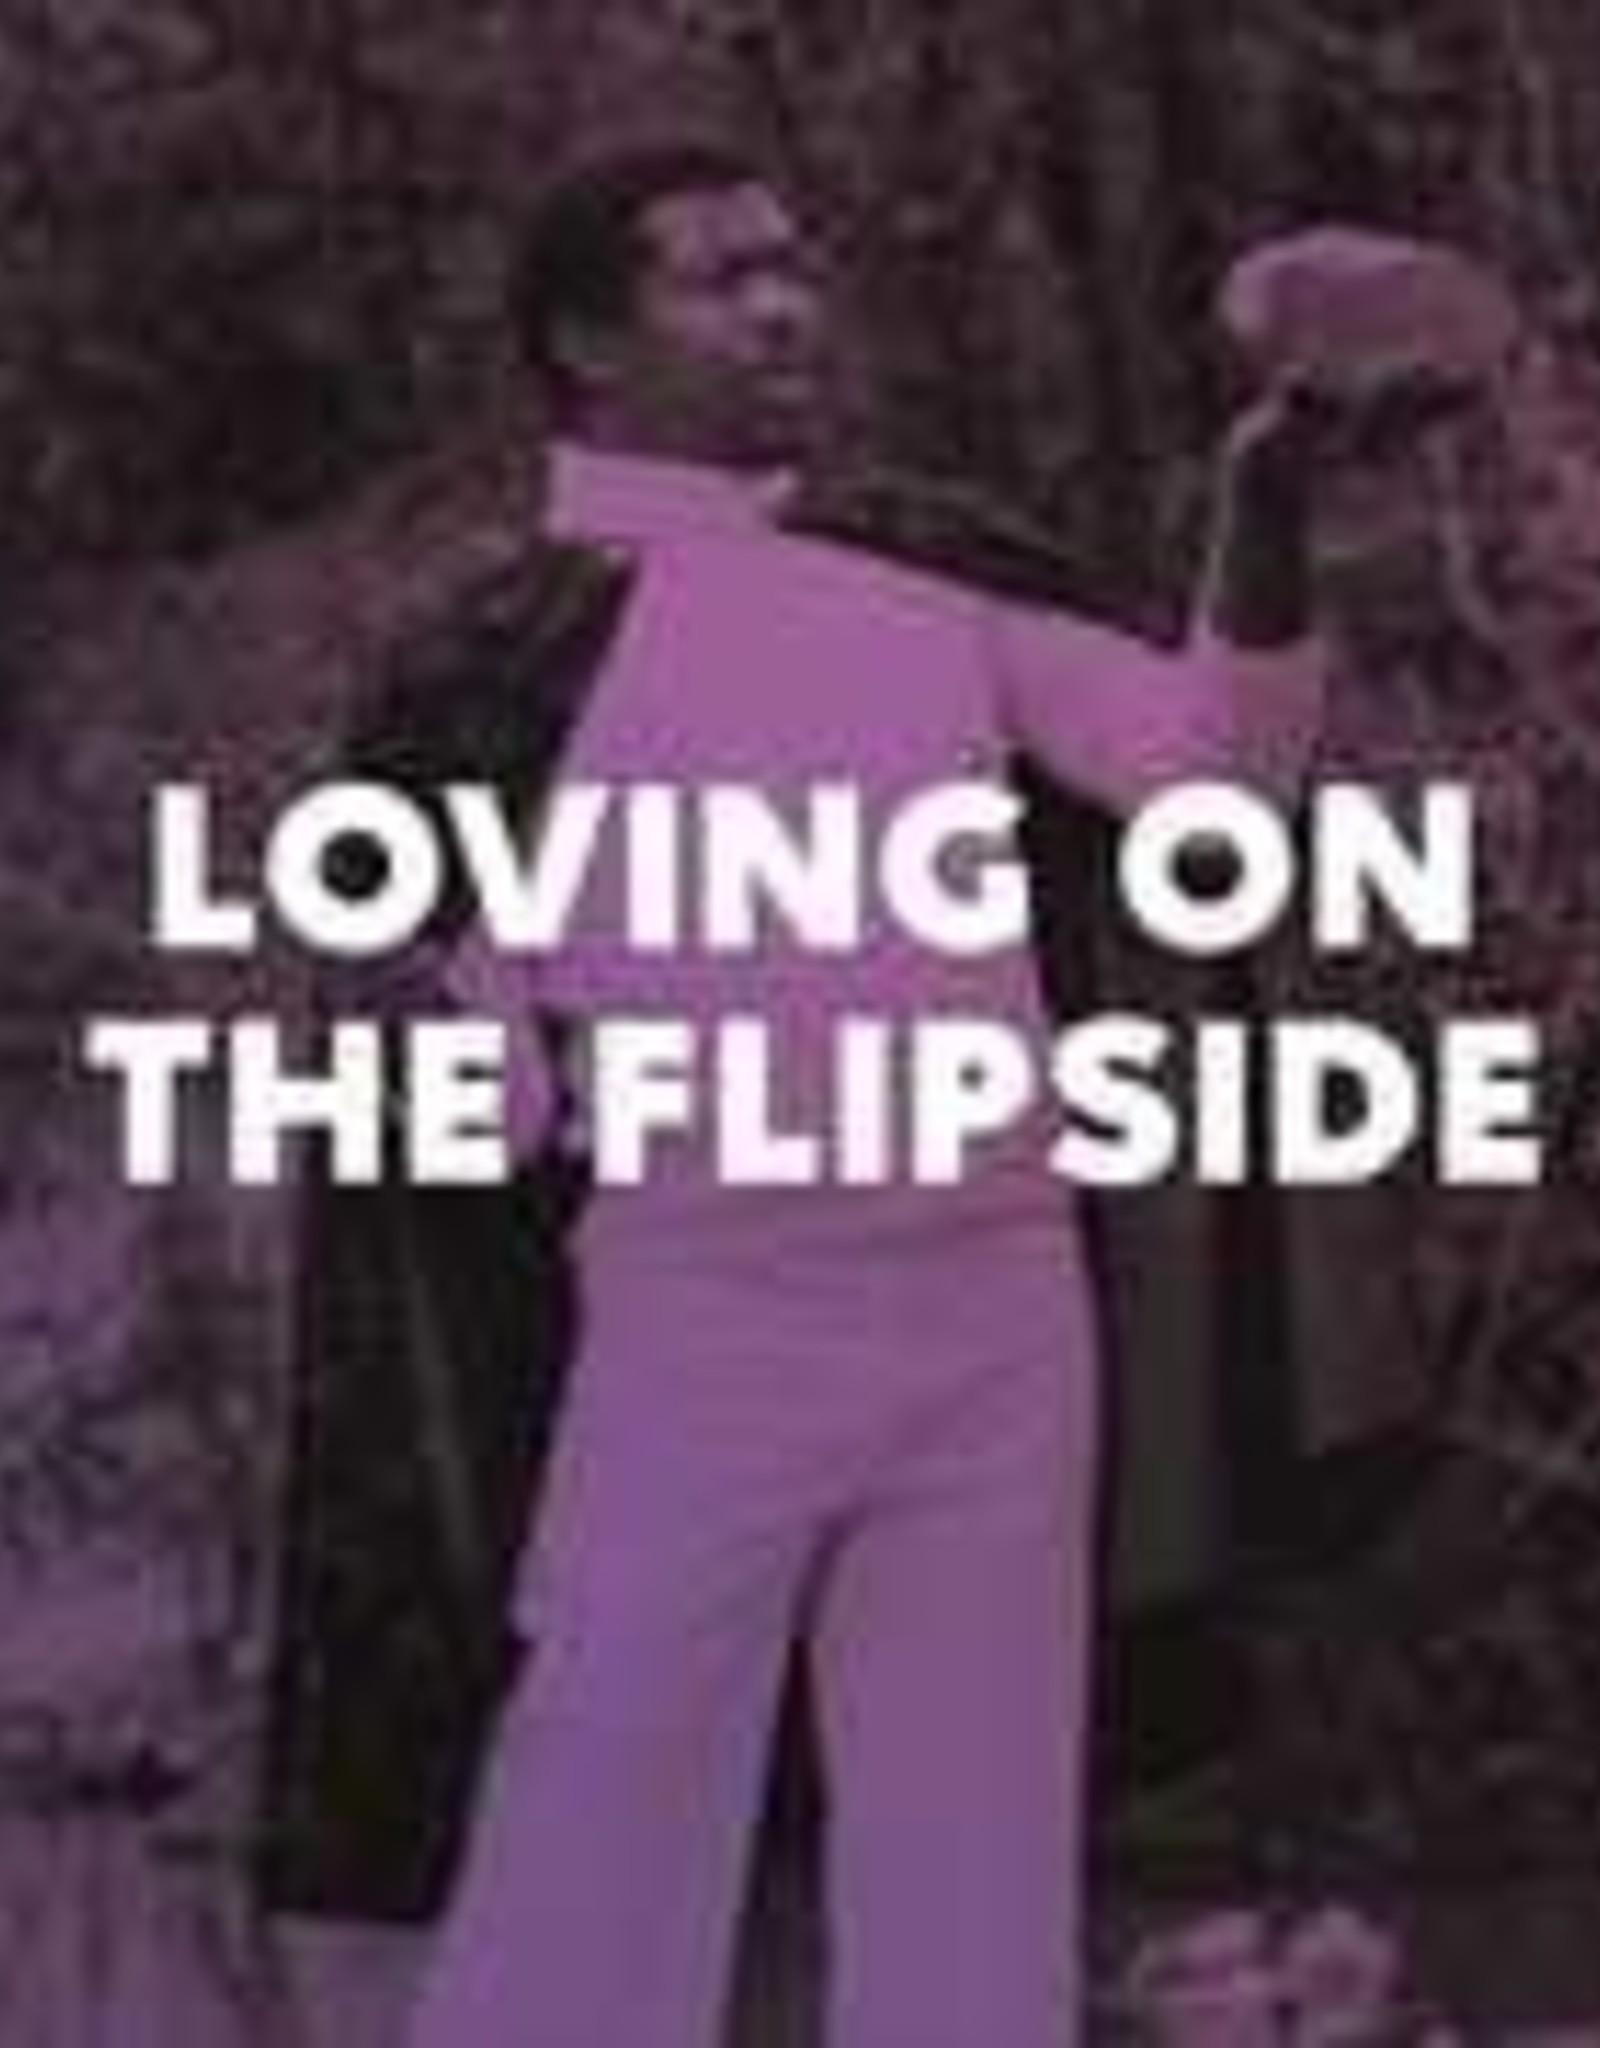 Loving On The Flipside - Loving On The Flipside